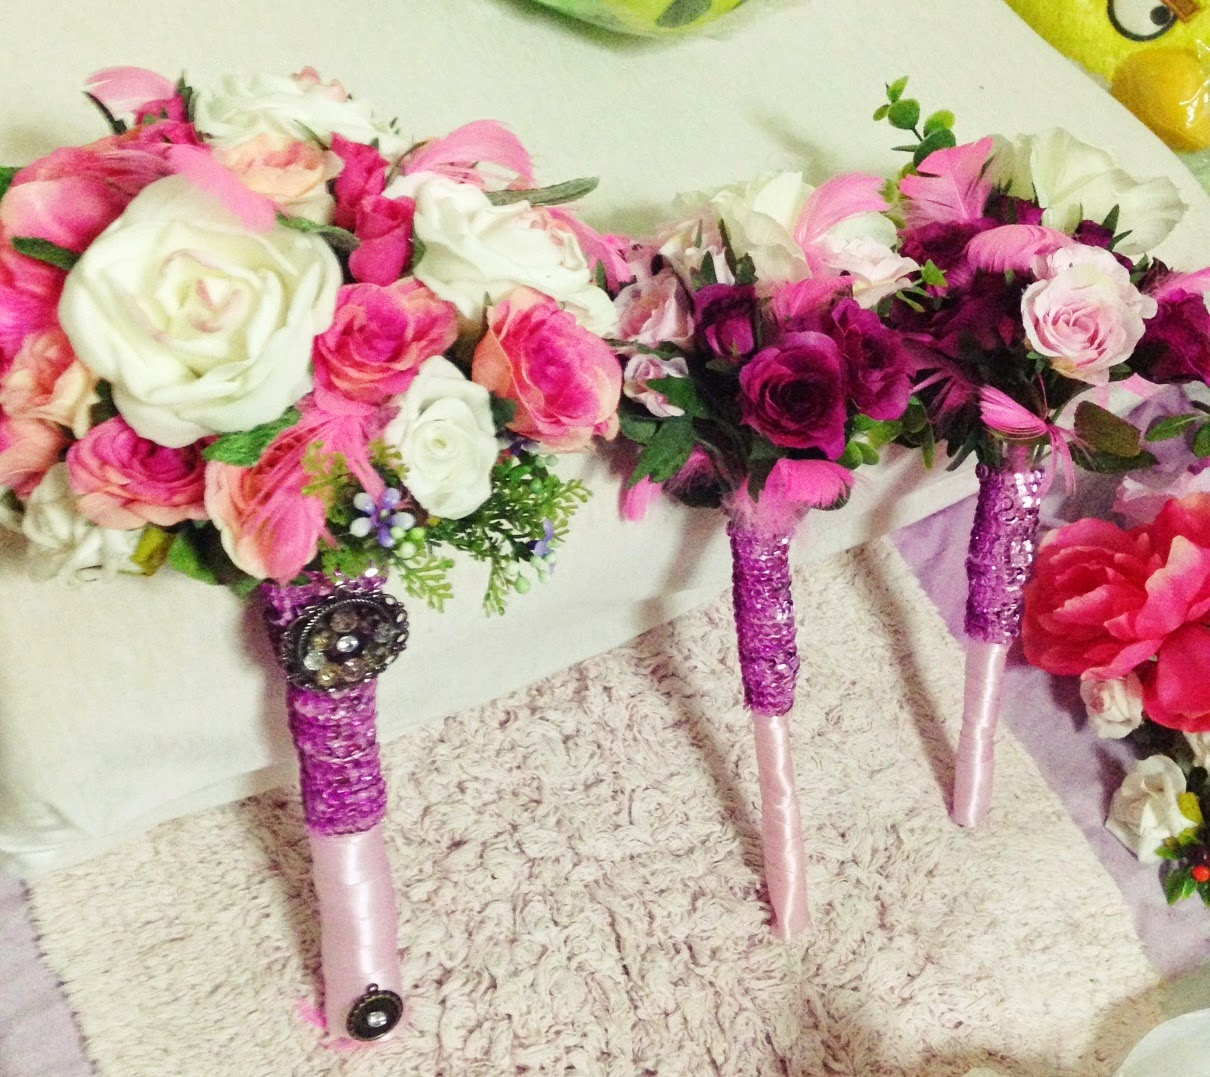 Myluckybride diy bridal bouquet your diy bridal bouquet with the entourage bouquets izmirmasajfo